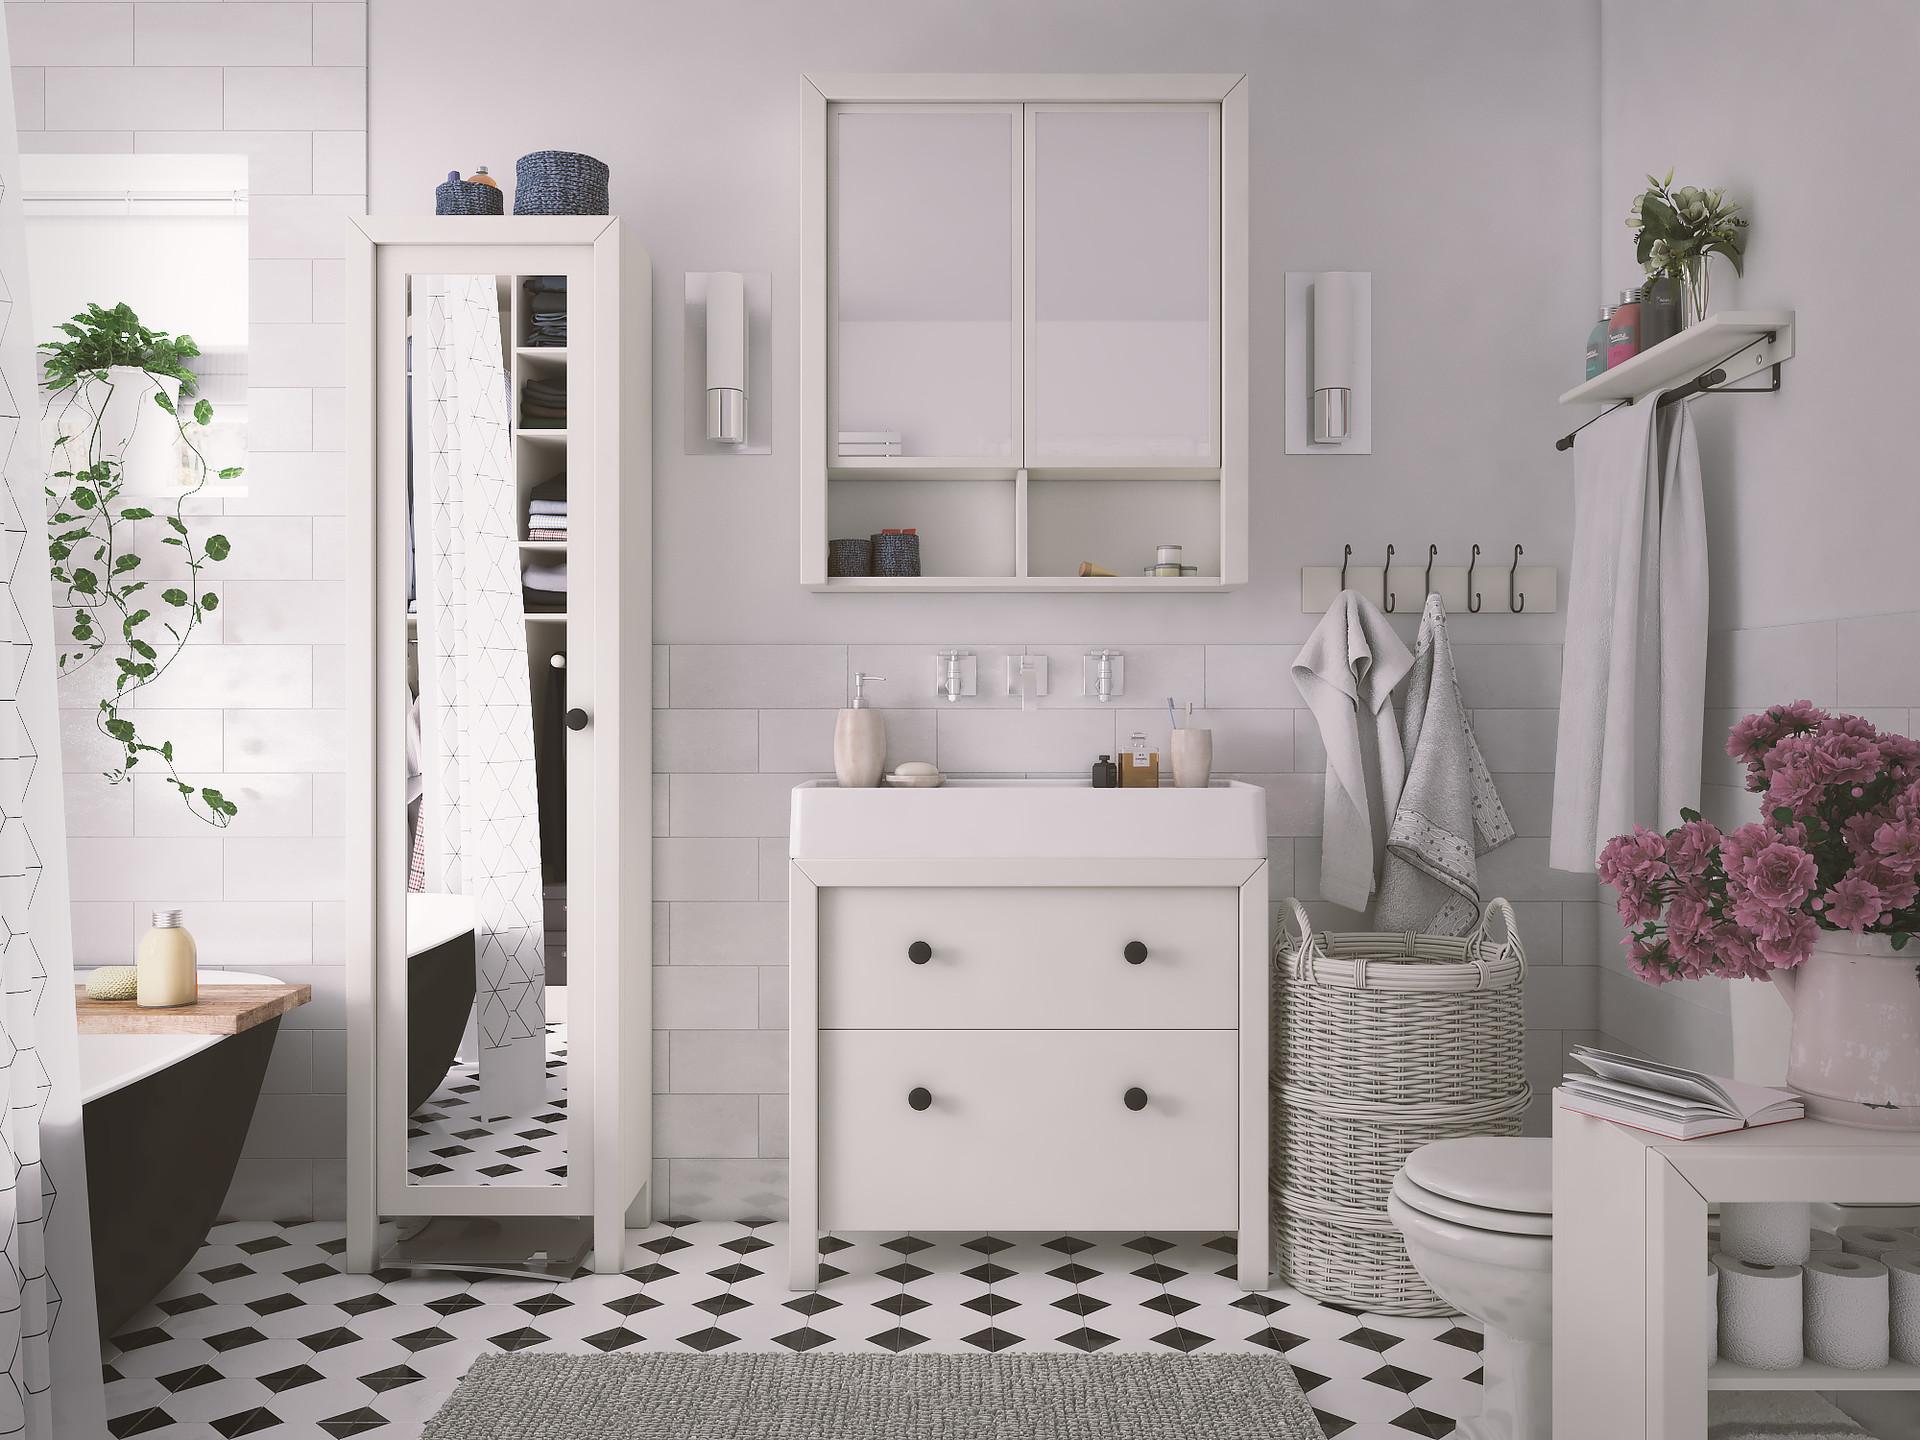 Francois bethermin romantic bathroom 001